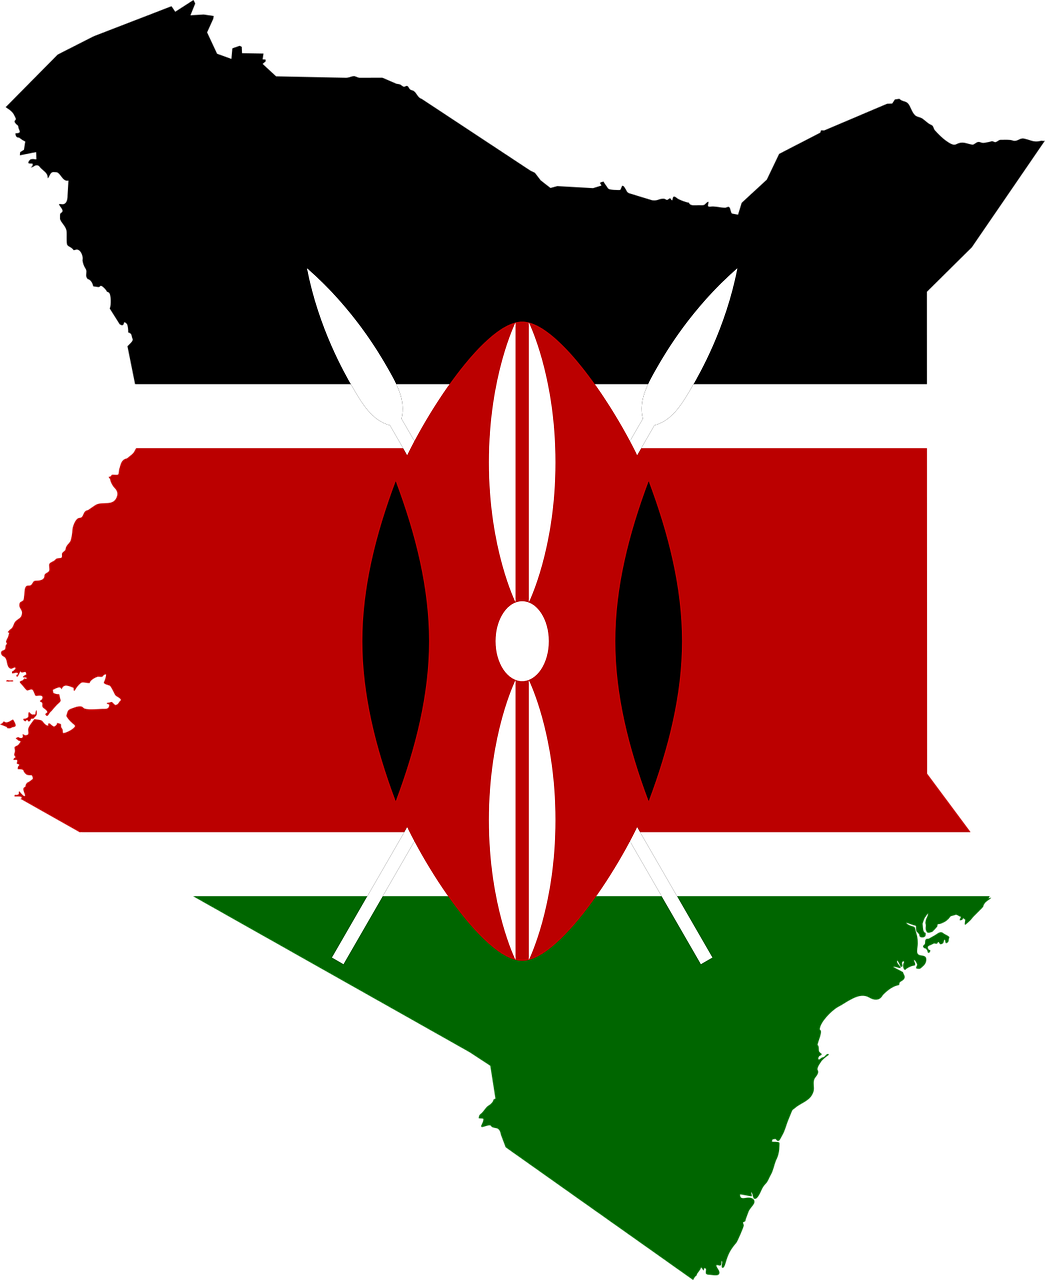 картинка презентация флаг кении омбре прекрасно